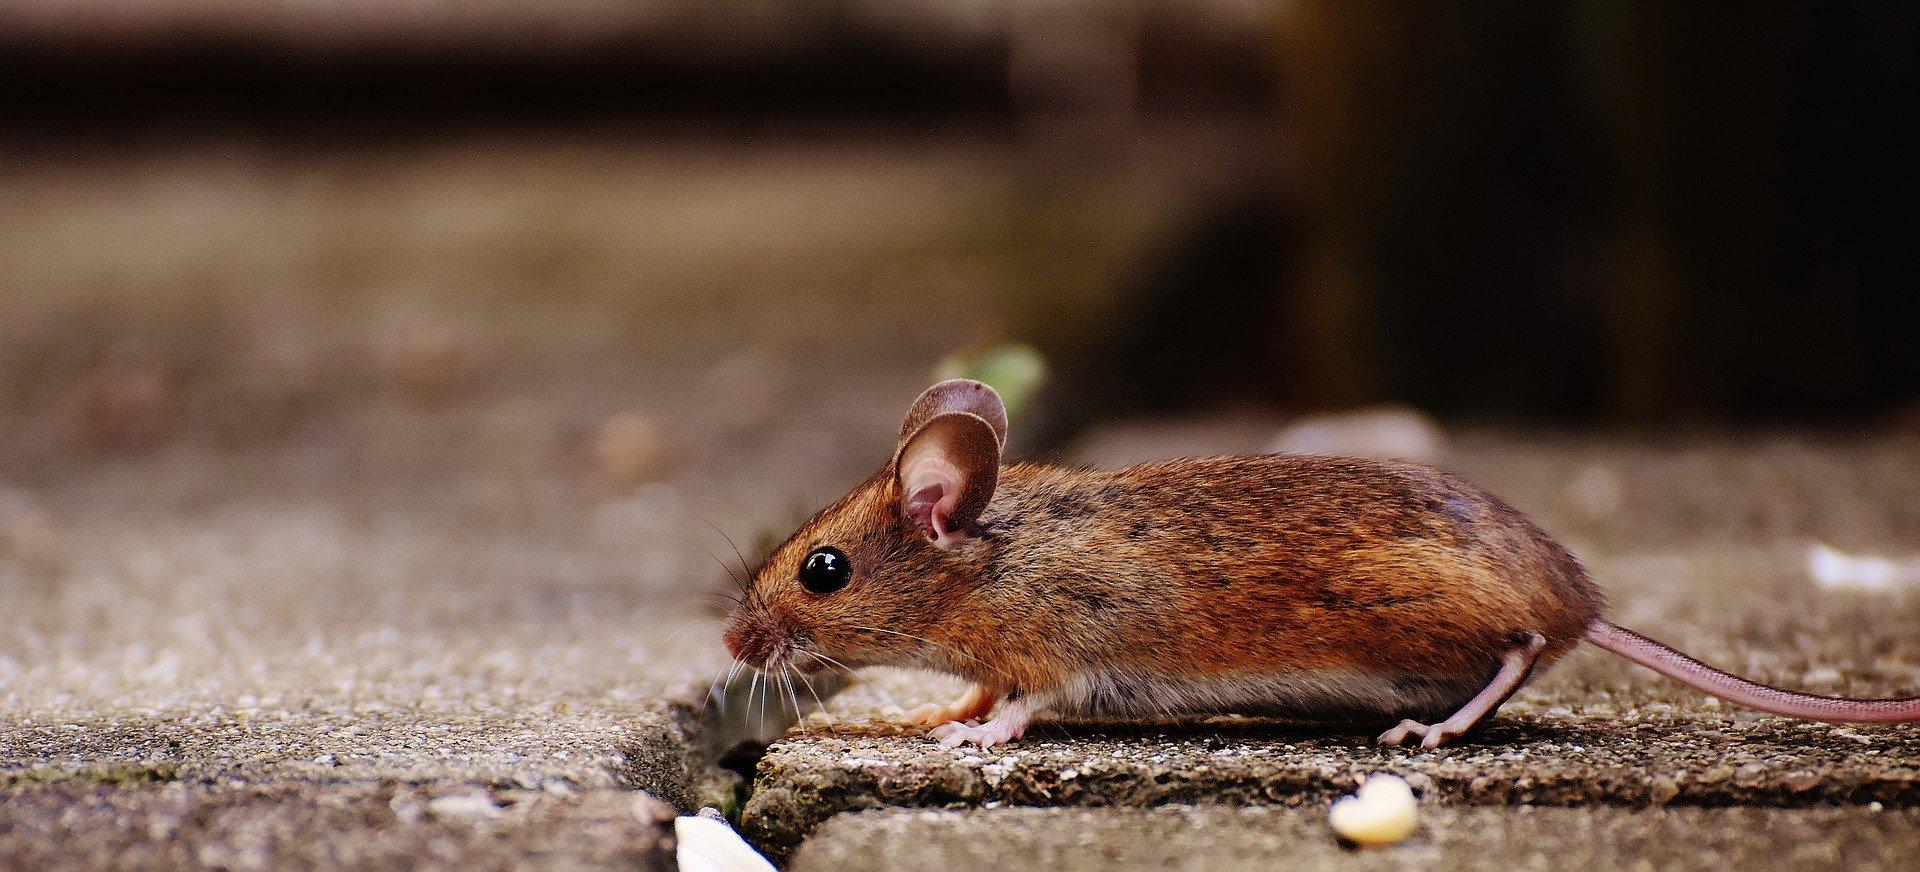 Raton. Fuente: Pixabay